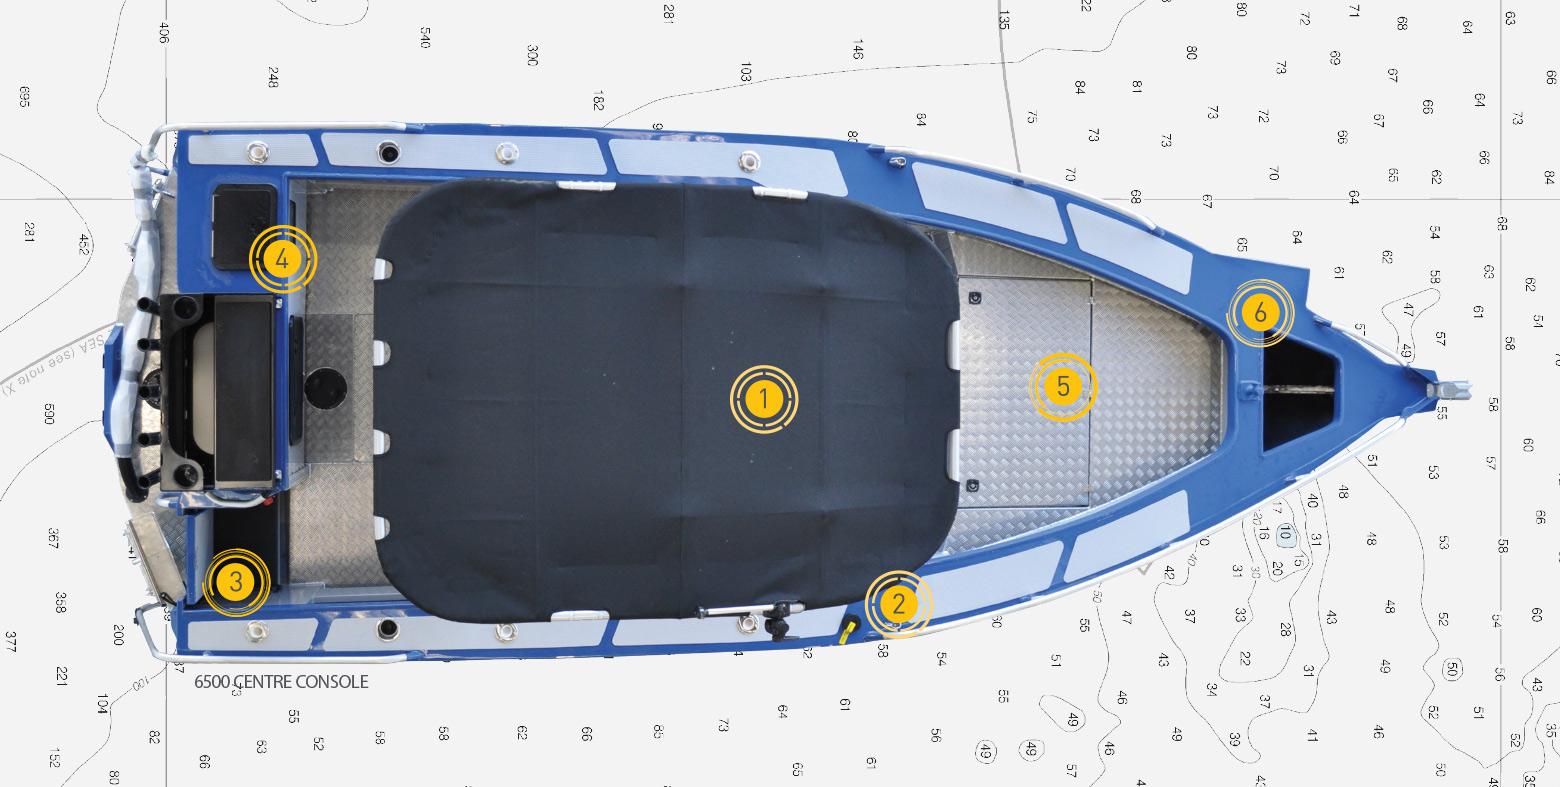 quintrex-yellowfin-15